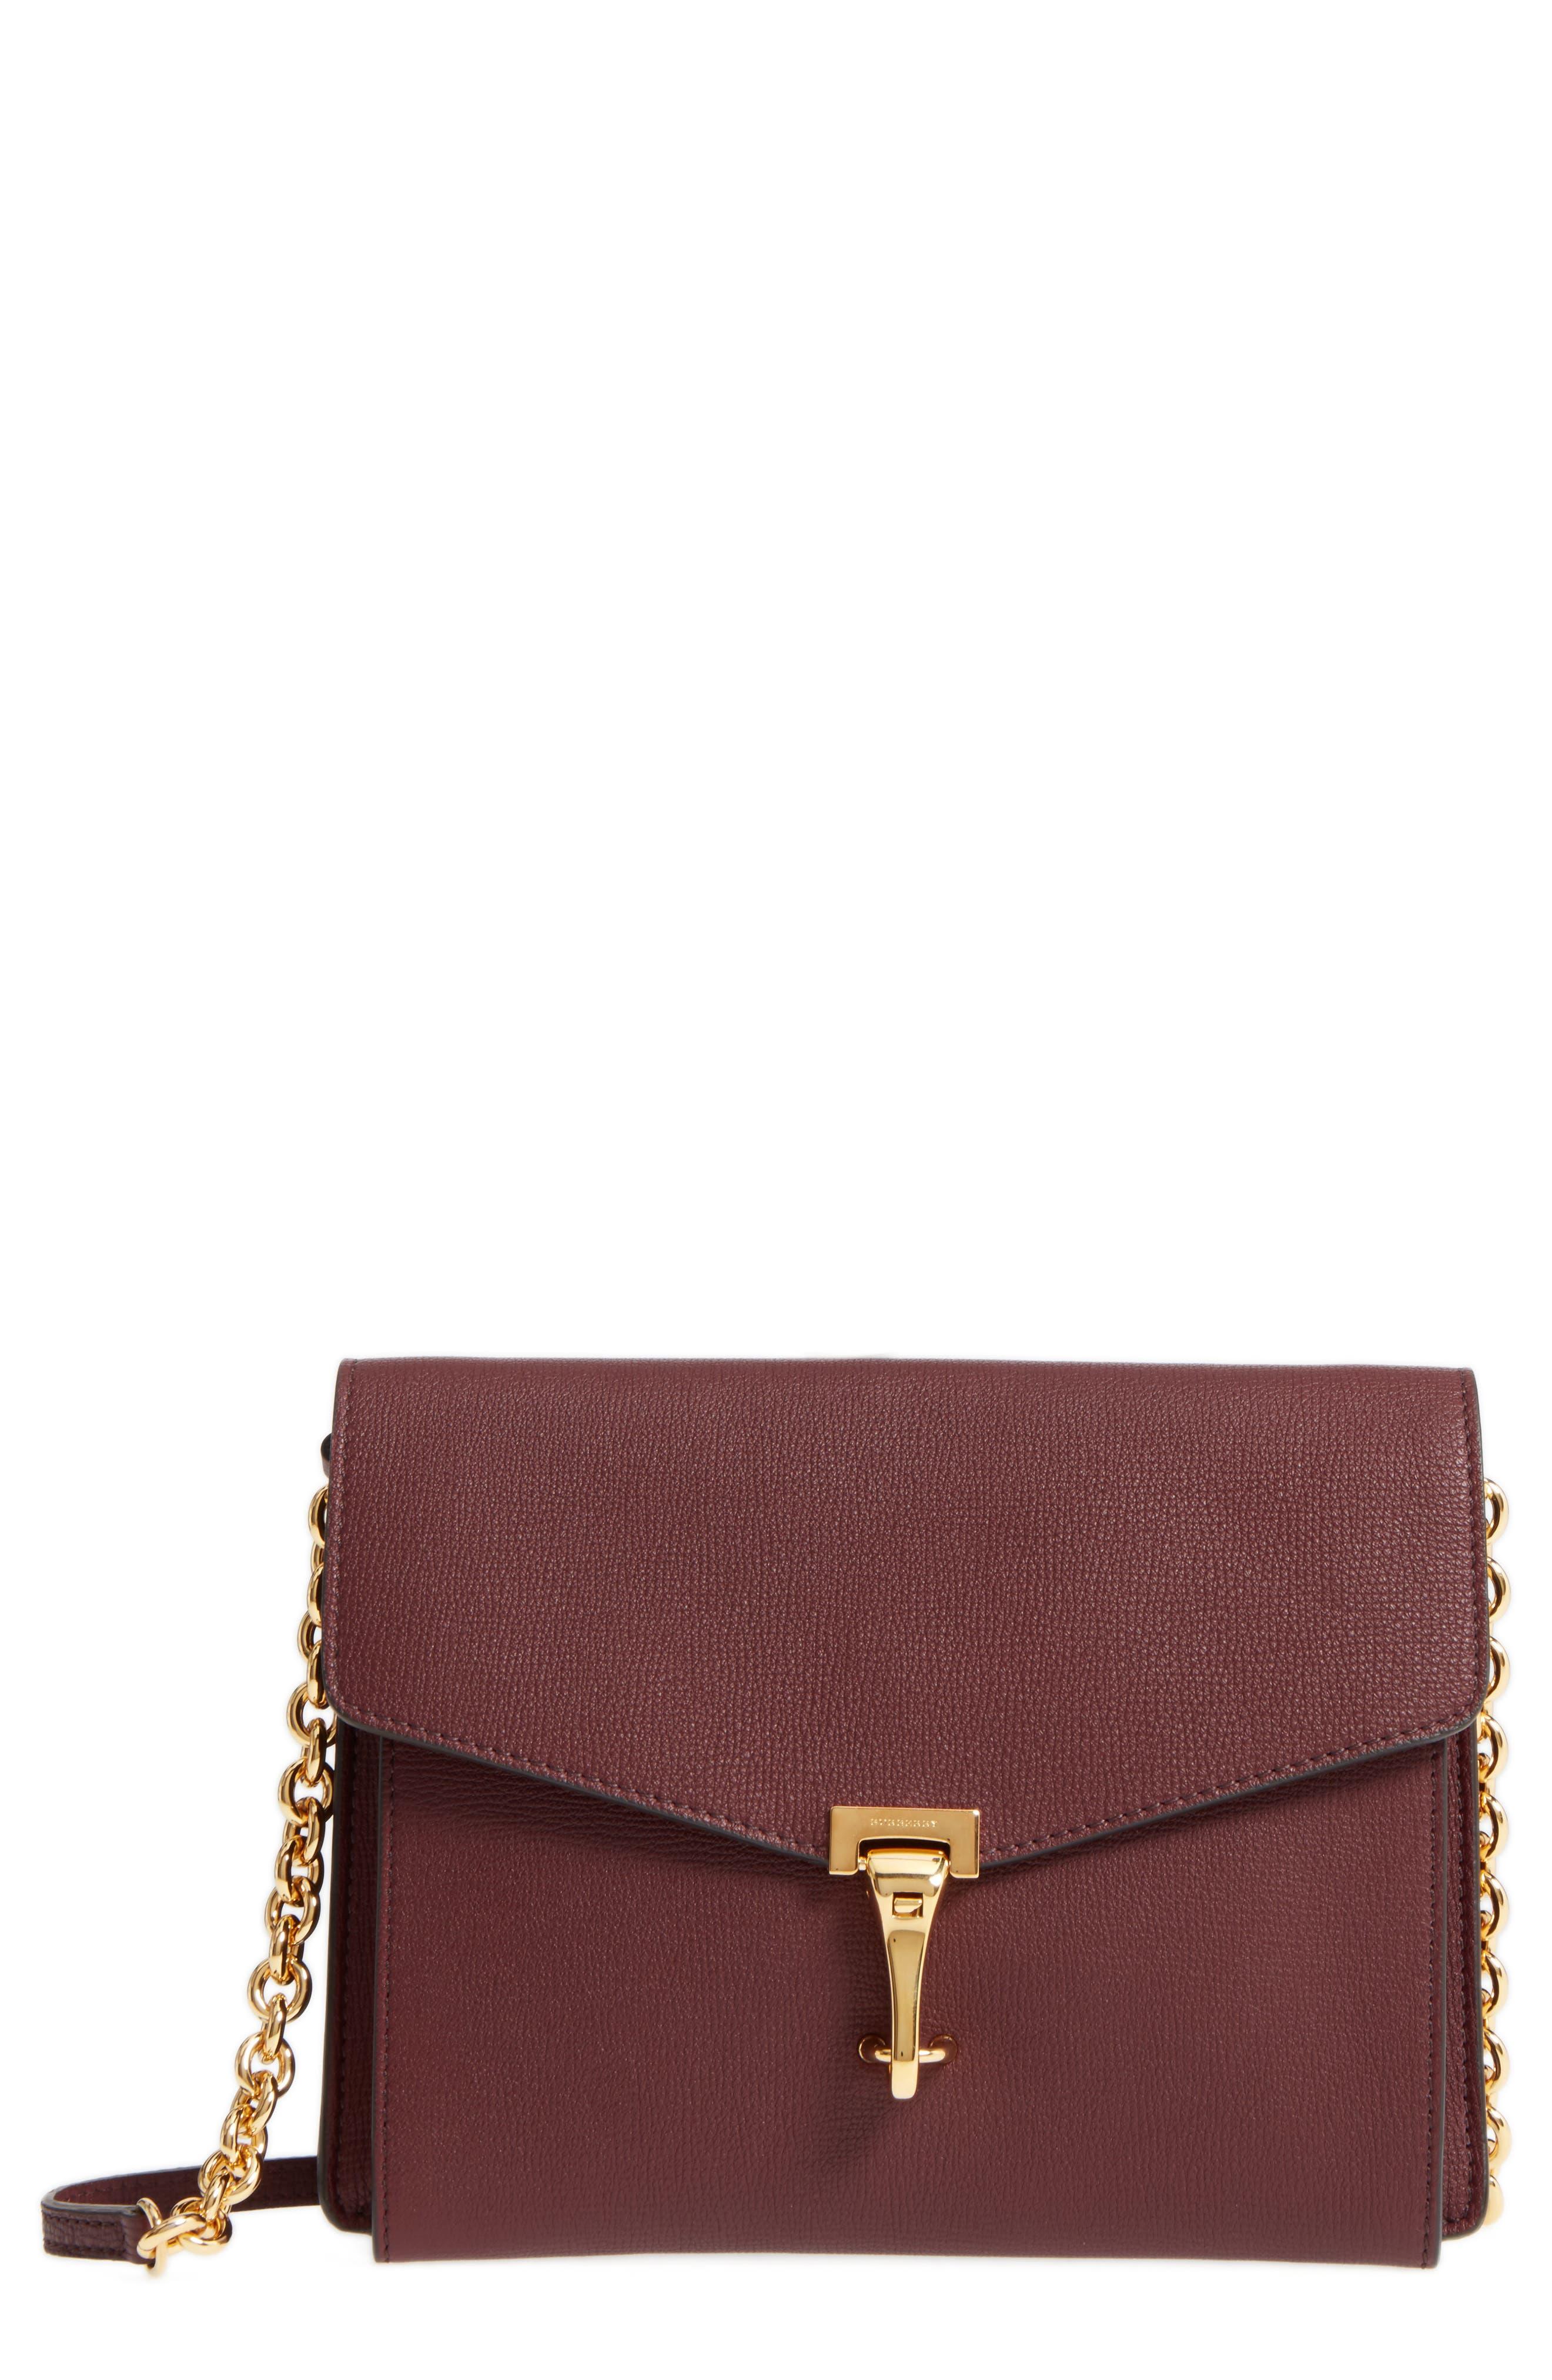 Macken Leather Derby Crossbody Bag,                             Main thumbnail 1, color,                             606